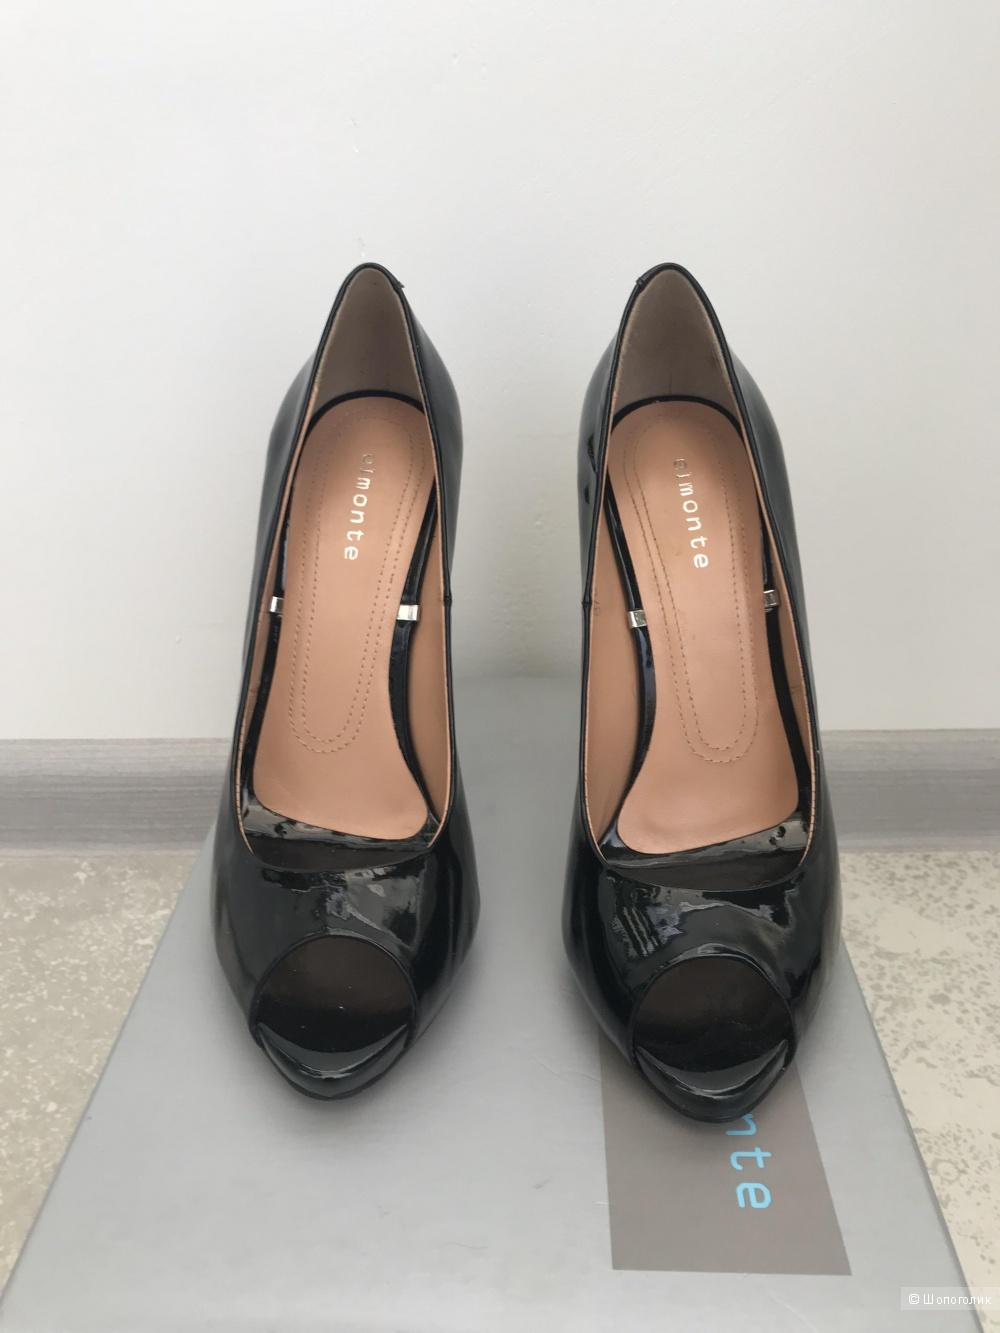 Туфли с открытым носом, 37 размер,  фирма Elmonte